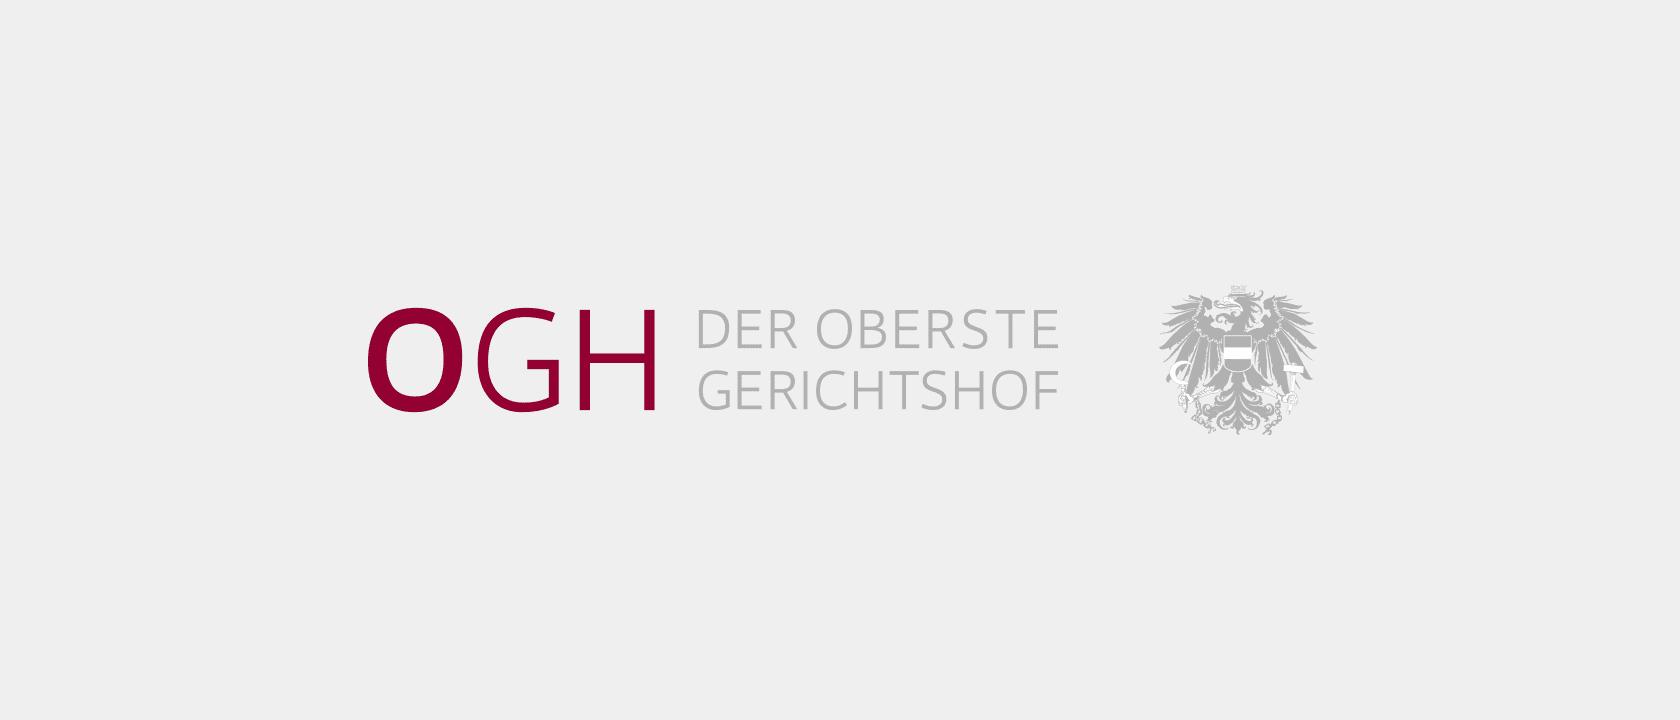 Neues Logo erstellen lassen Wien